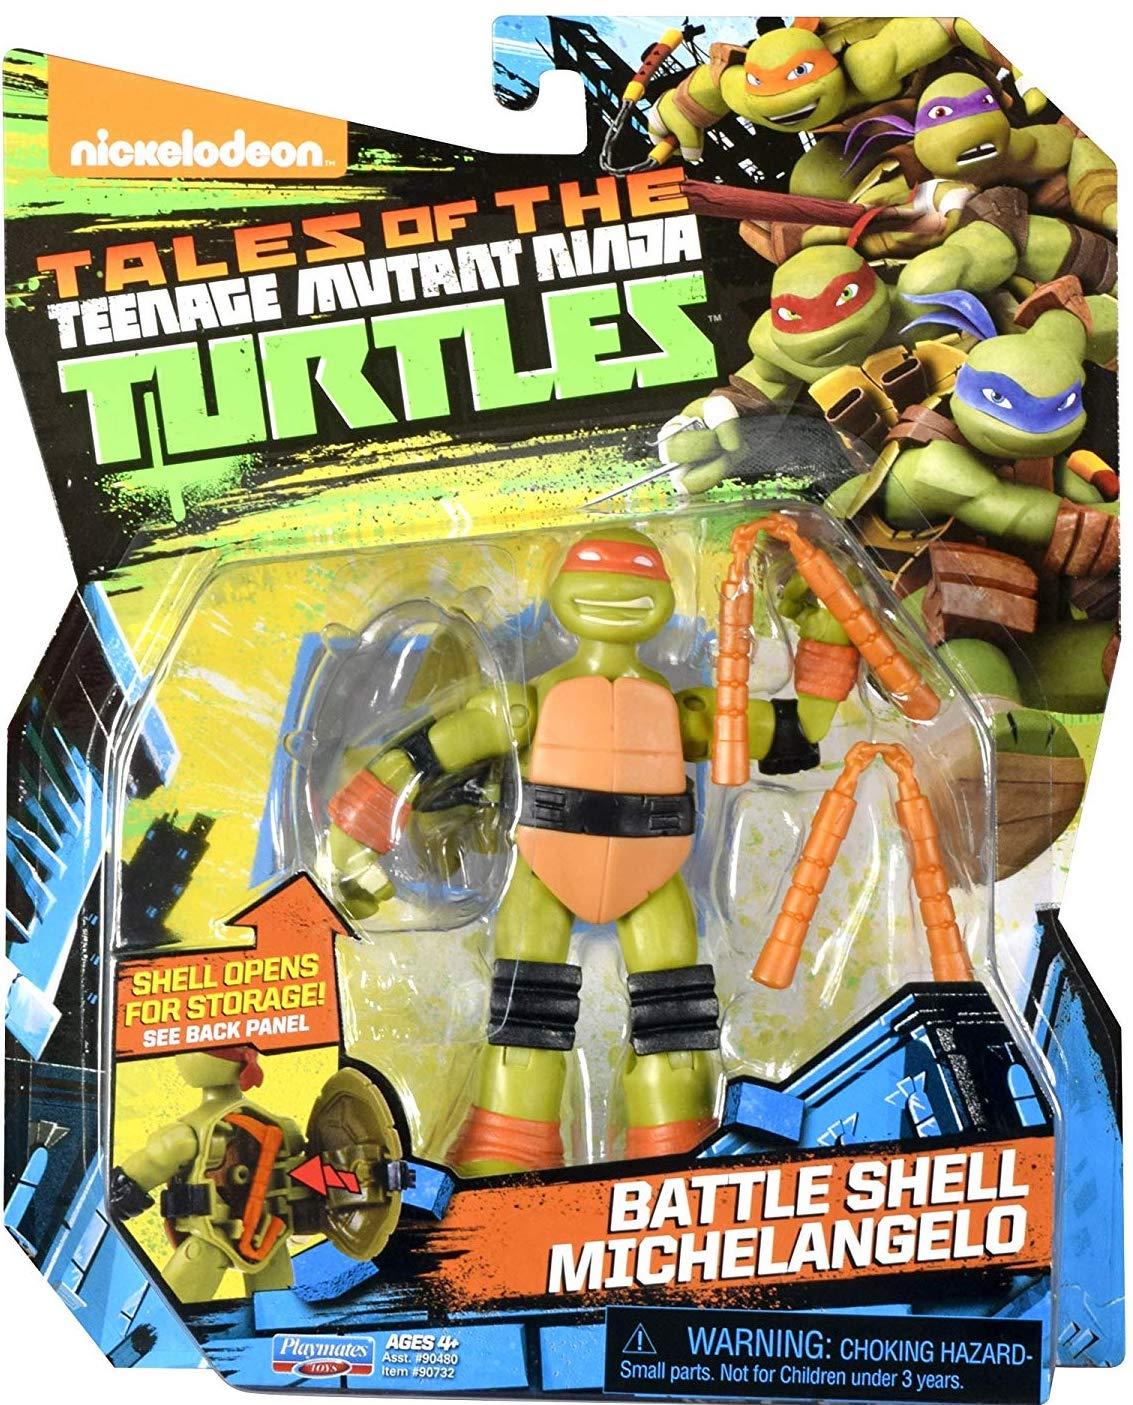 Battle Shell Michelangelo (2017 action figure)